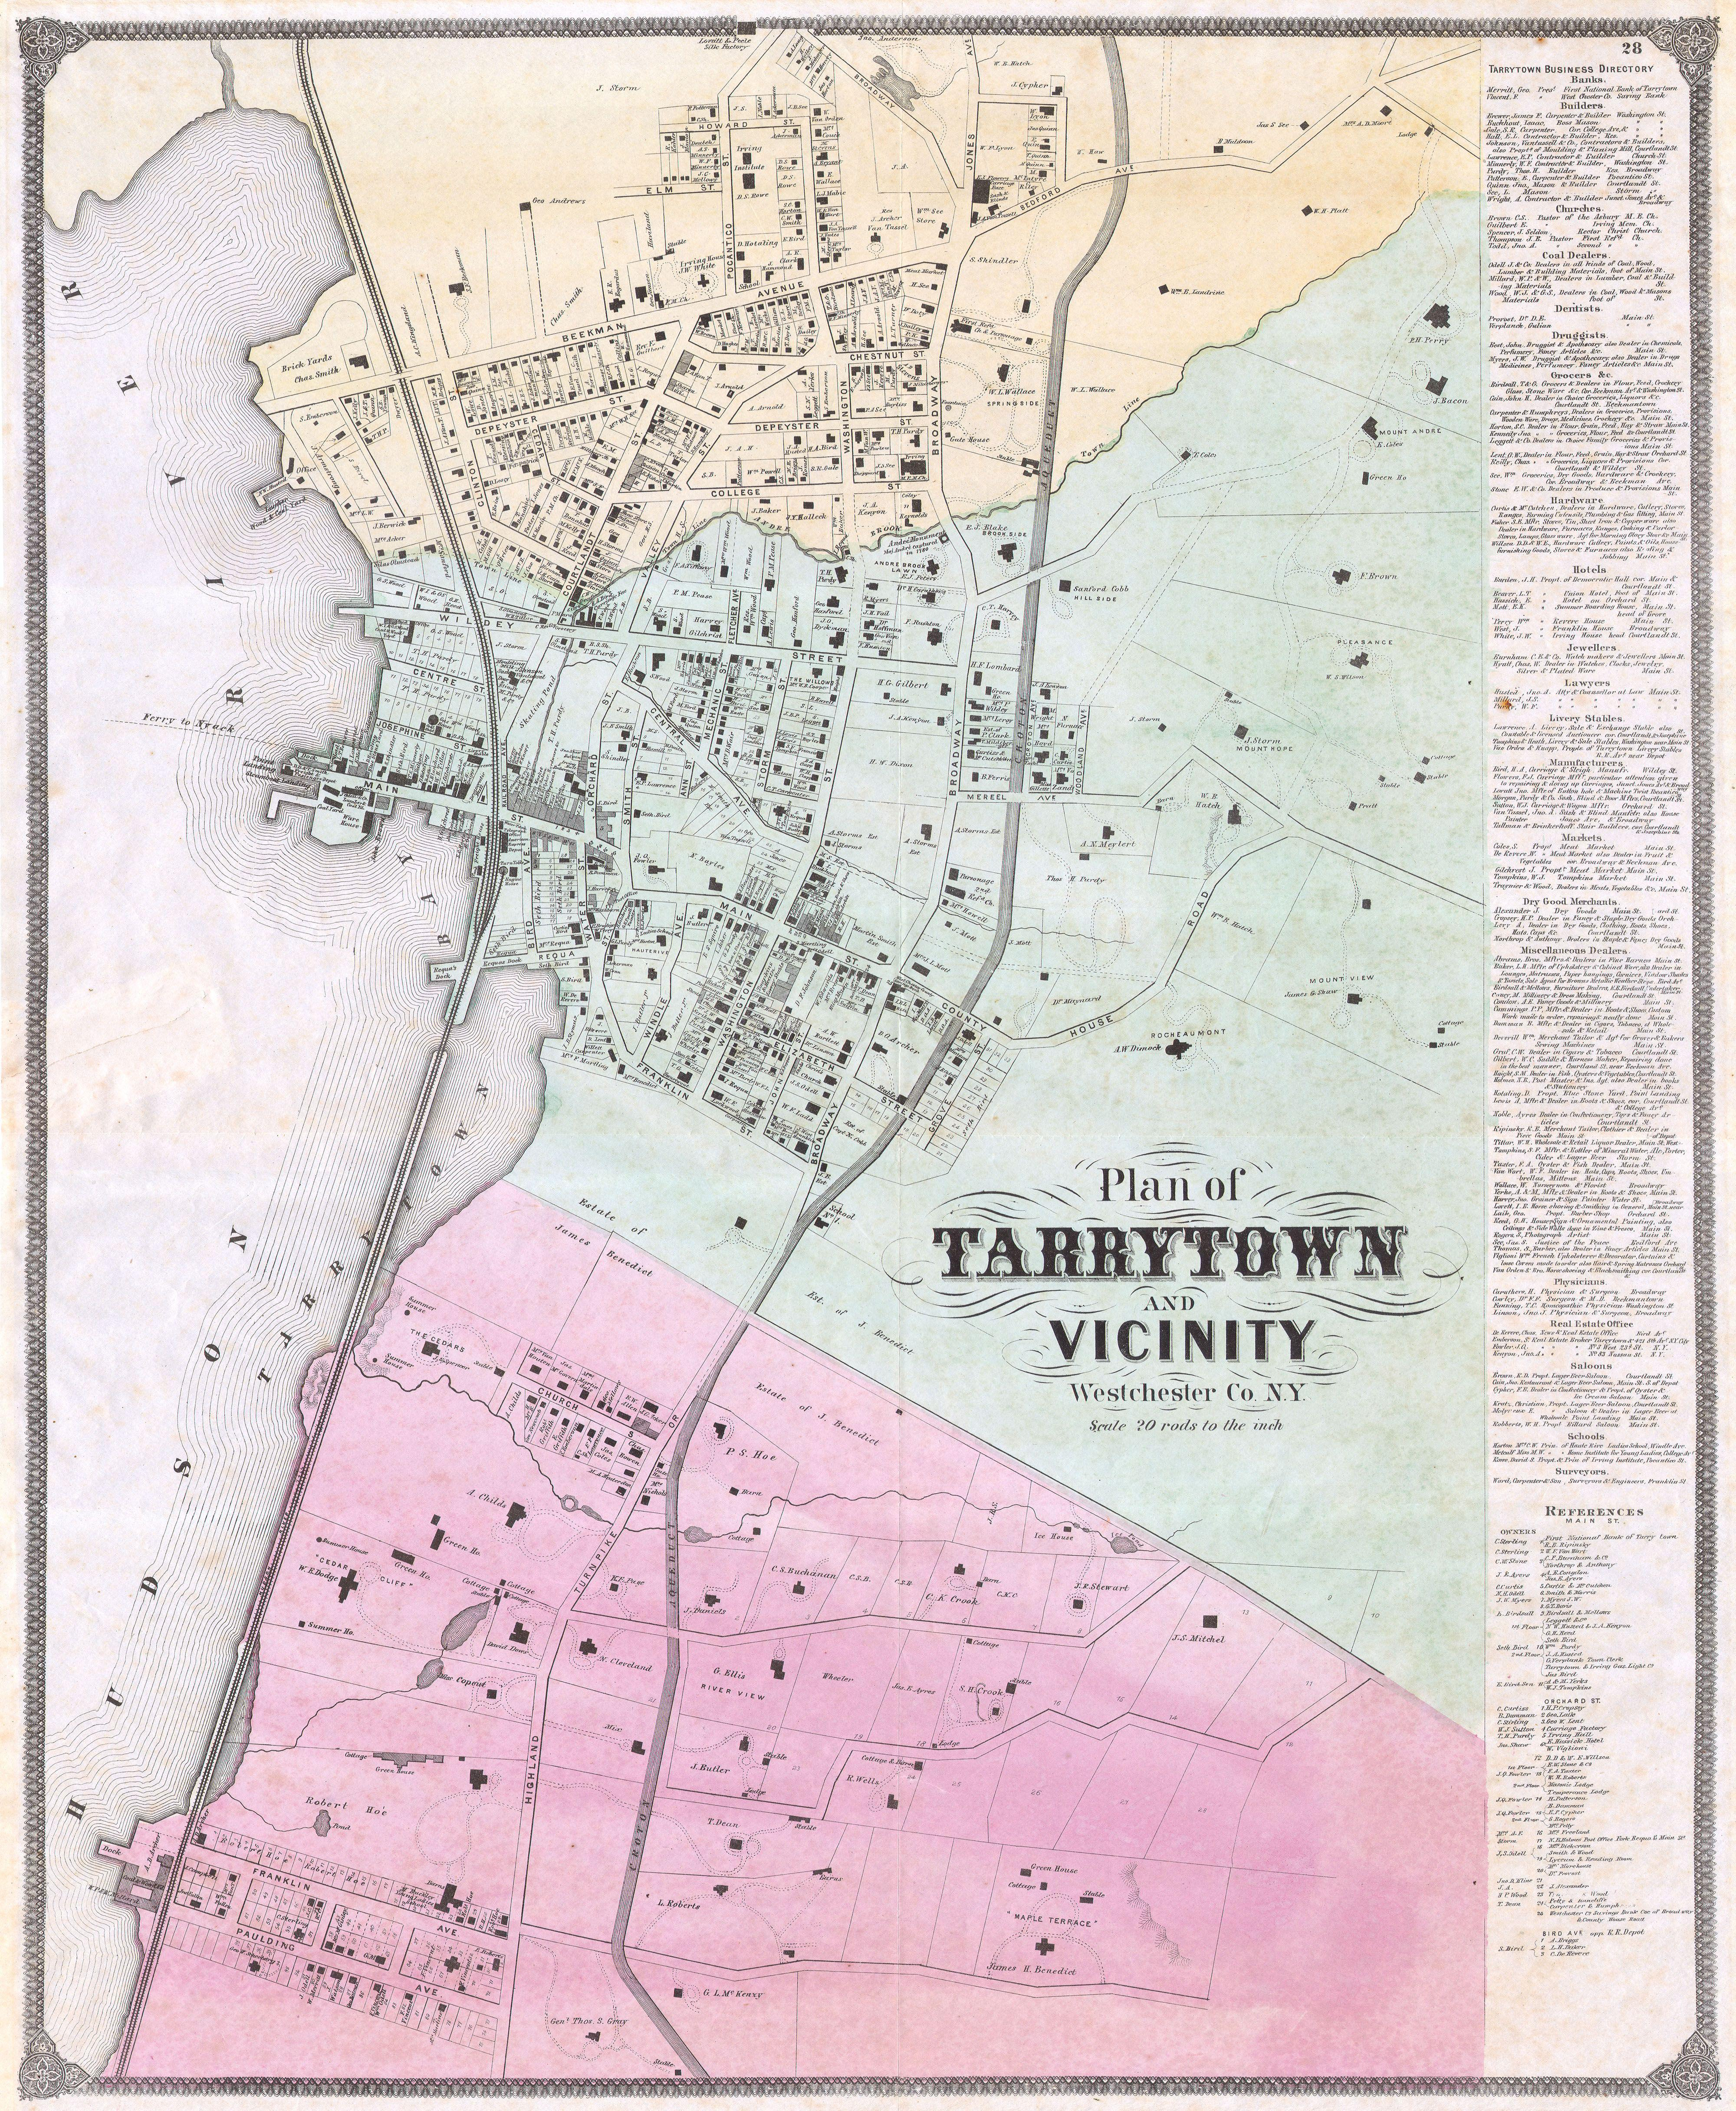 Sleepy Hollow Ny Map: File:1868 Beers Map Of Tarrytown ( Sleepy Hollow ), New